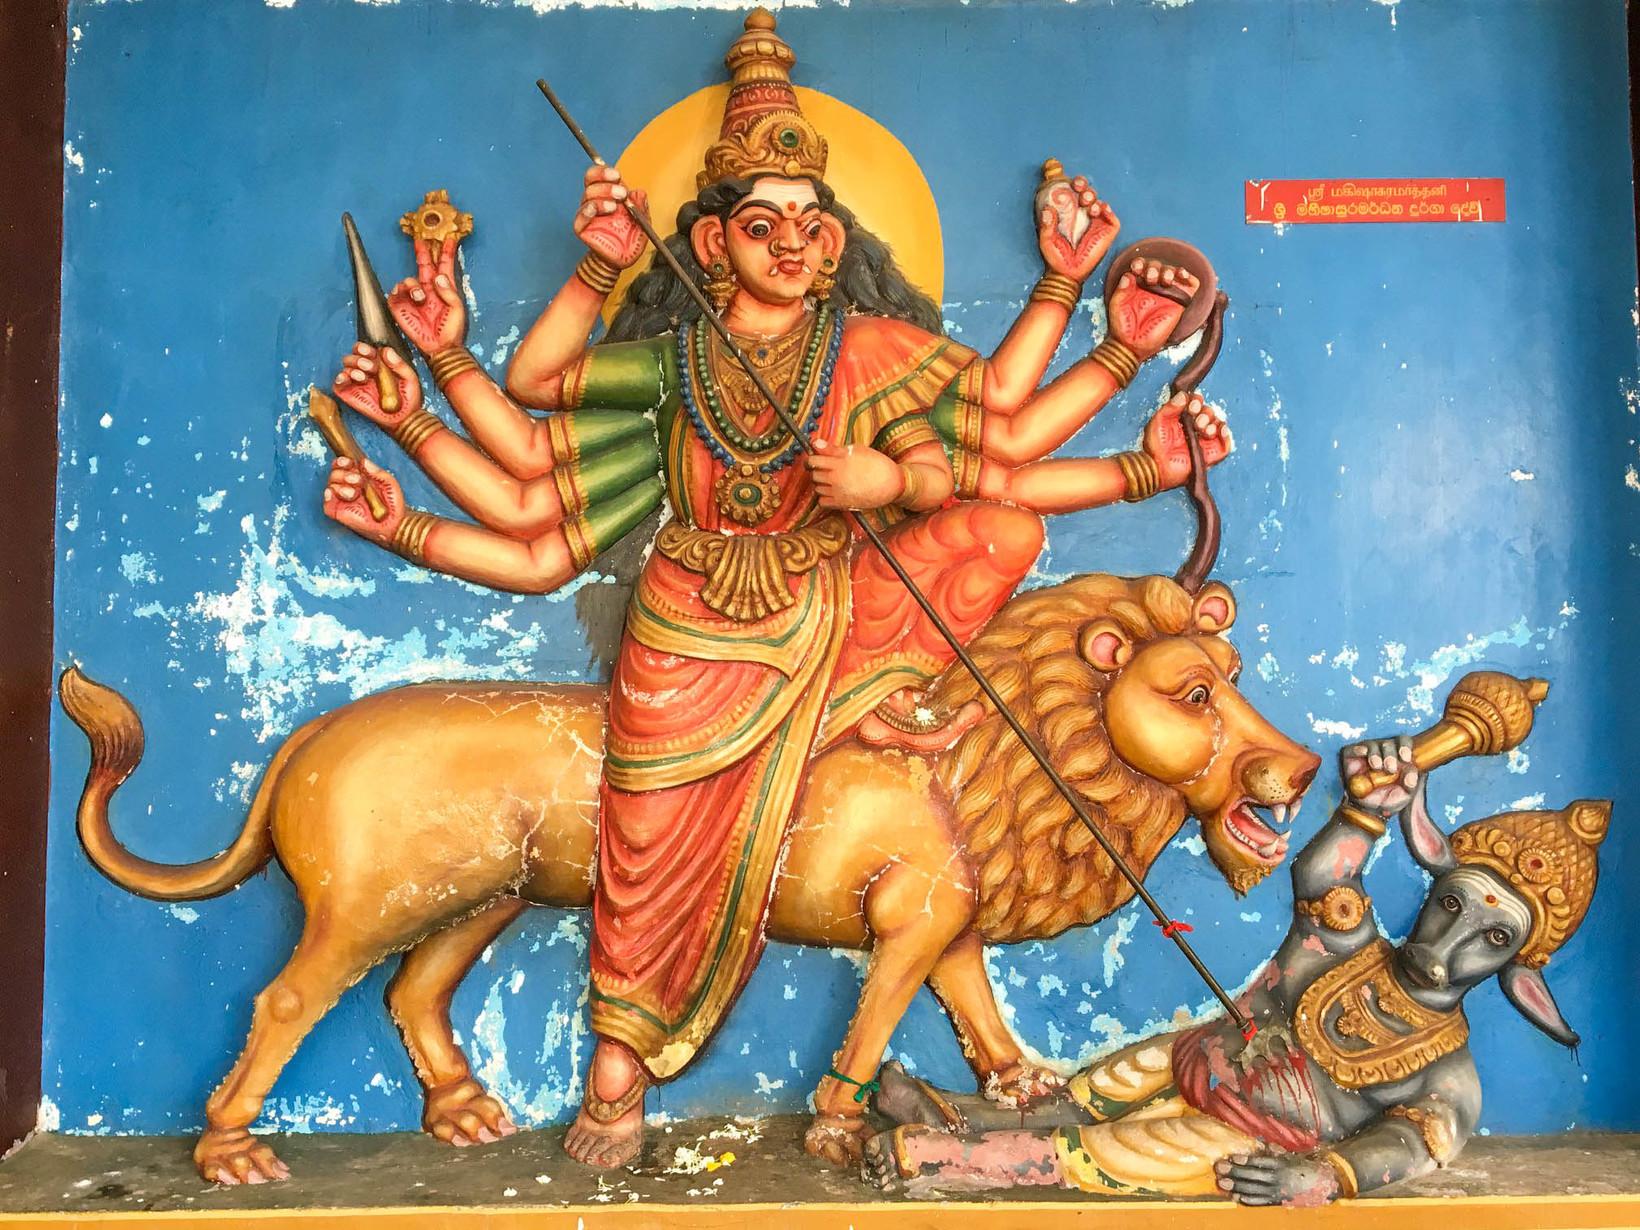 Sri Munneswaram Devasthanam, Chilaw - Lakpura™